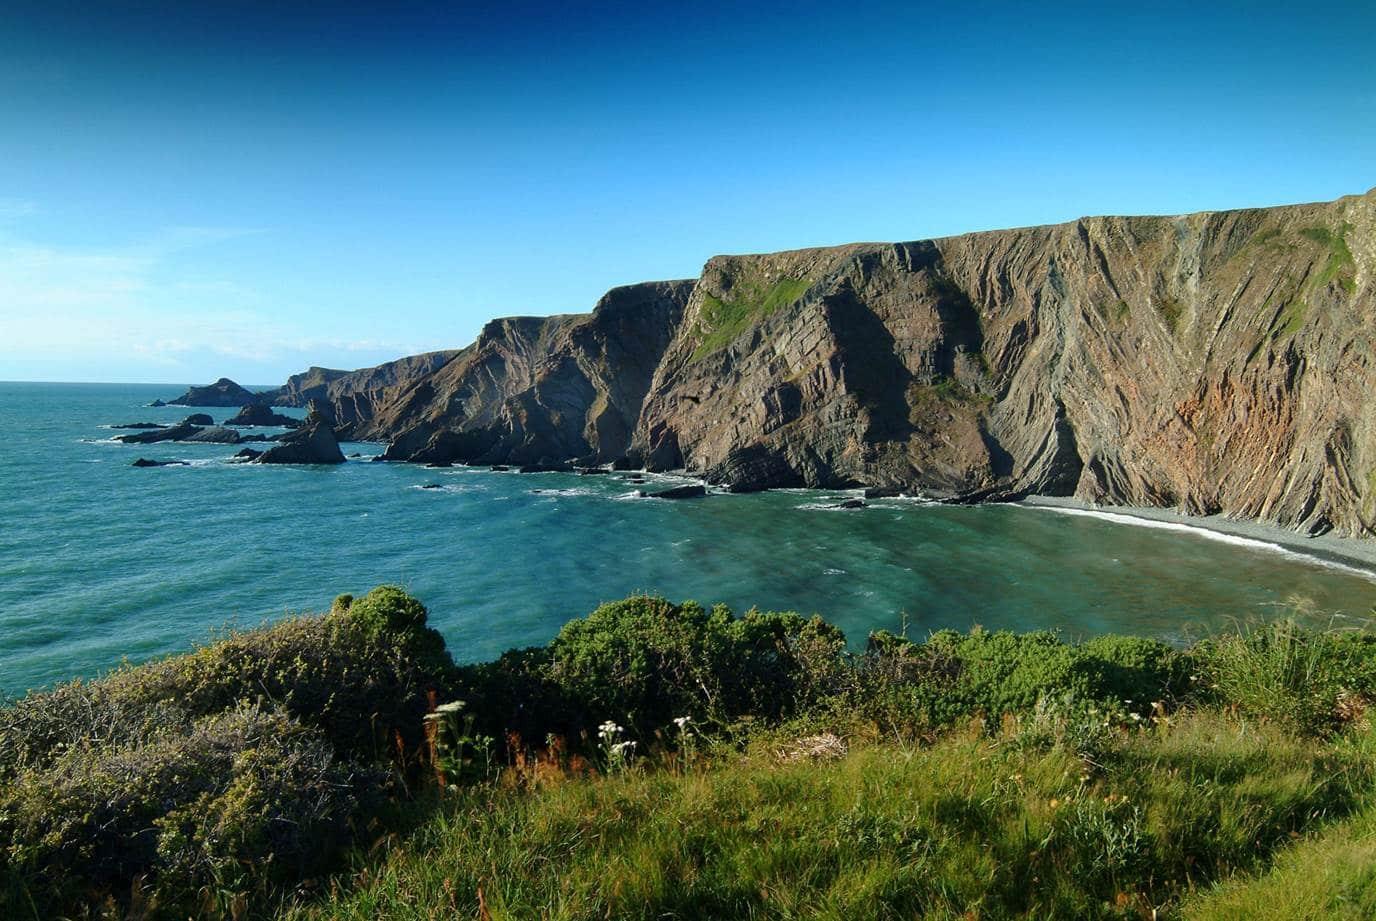 Photo of the Hartland Peninsula showing coastal cliffs and sea